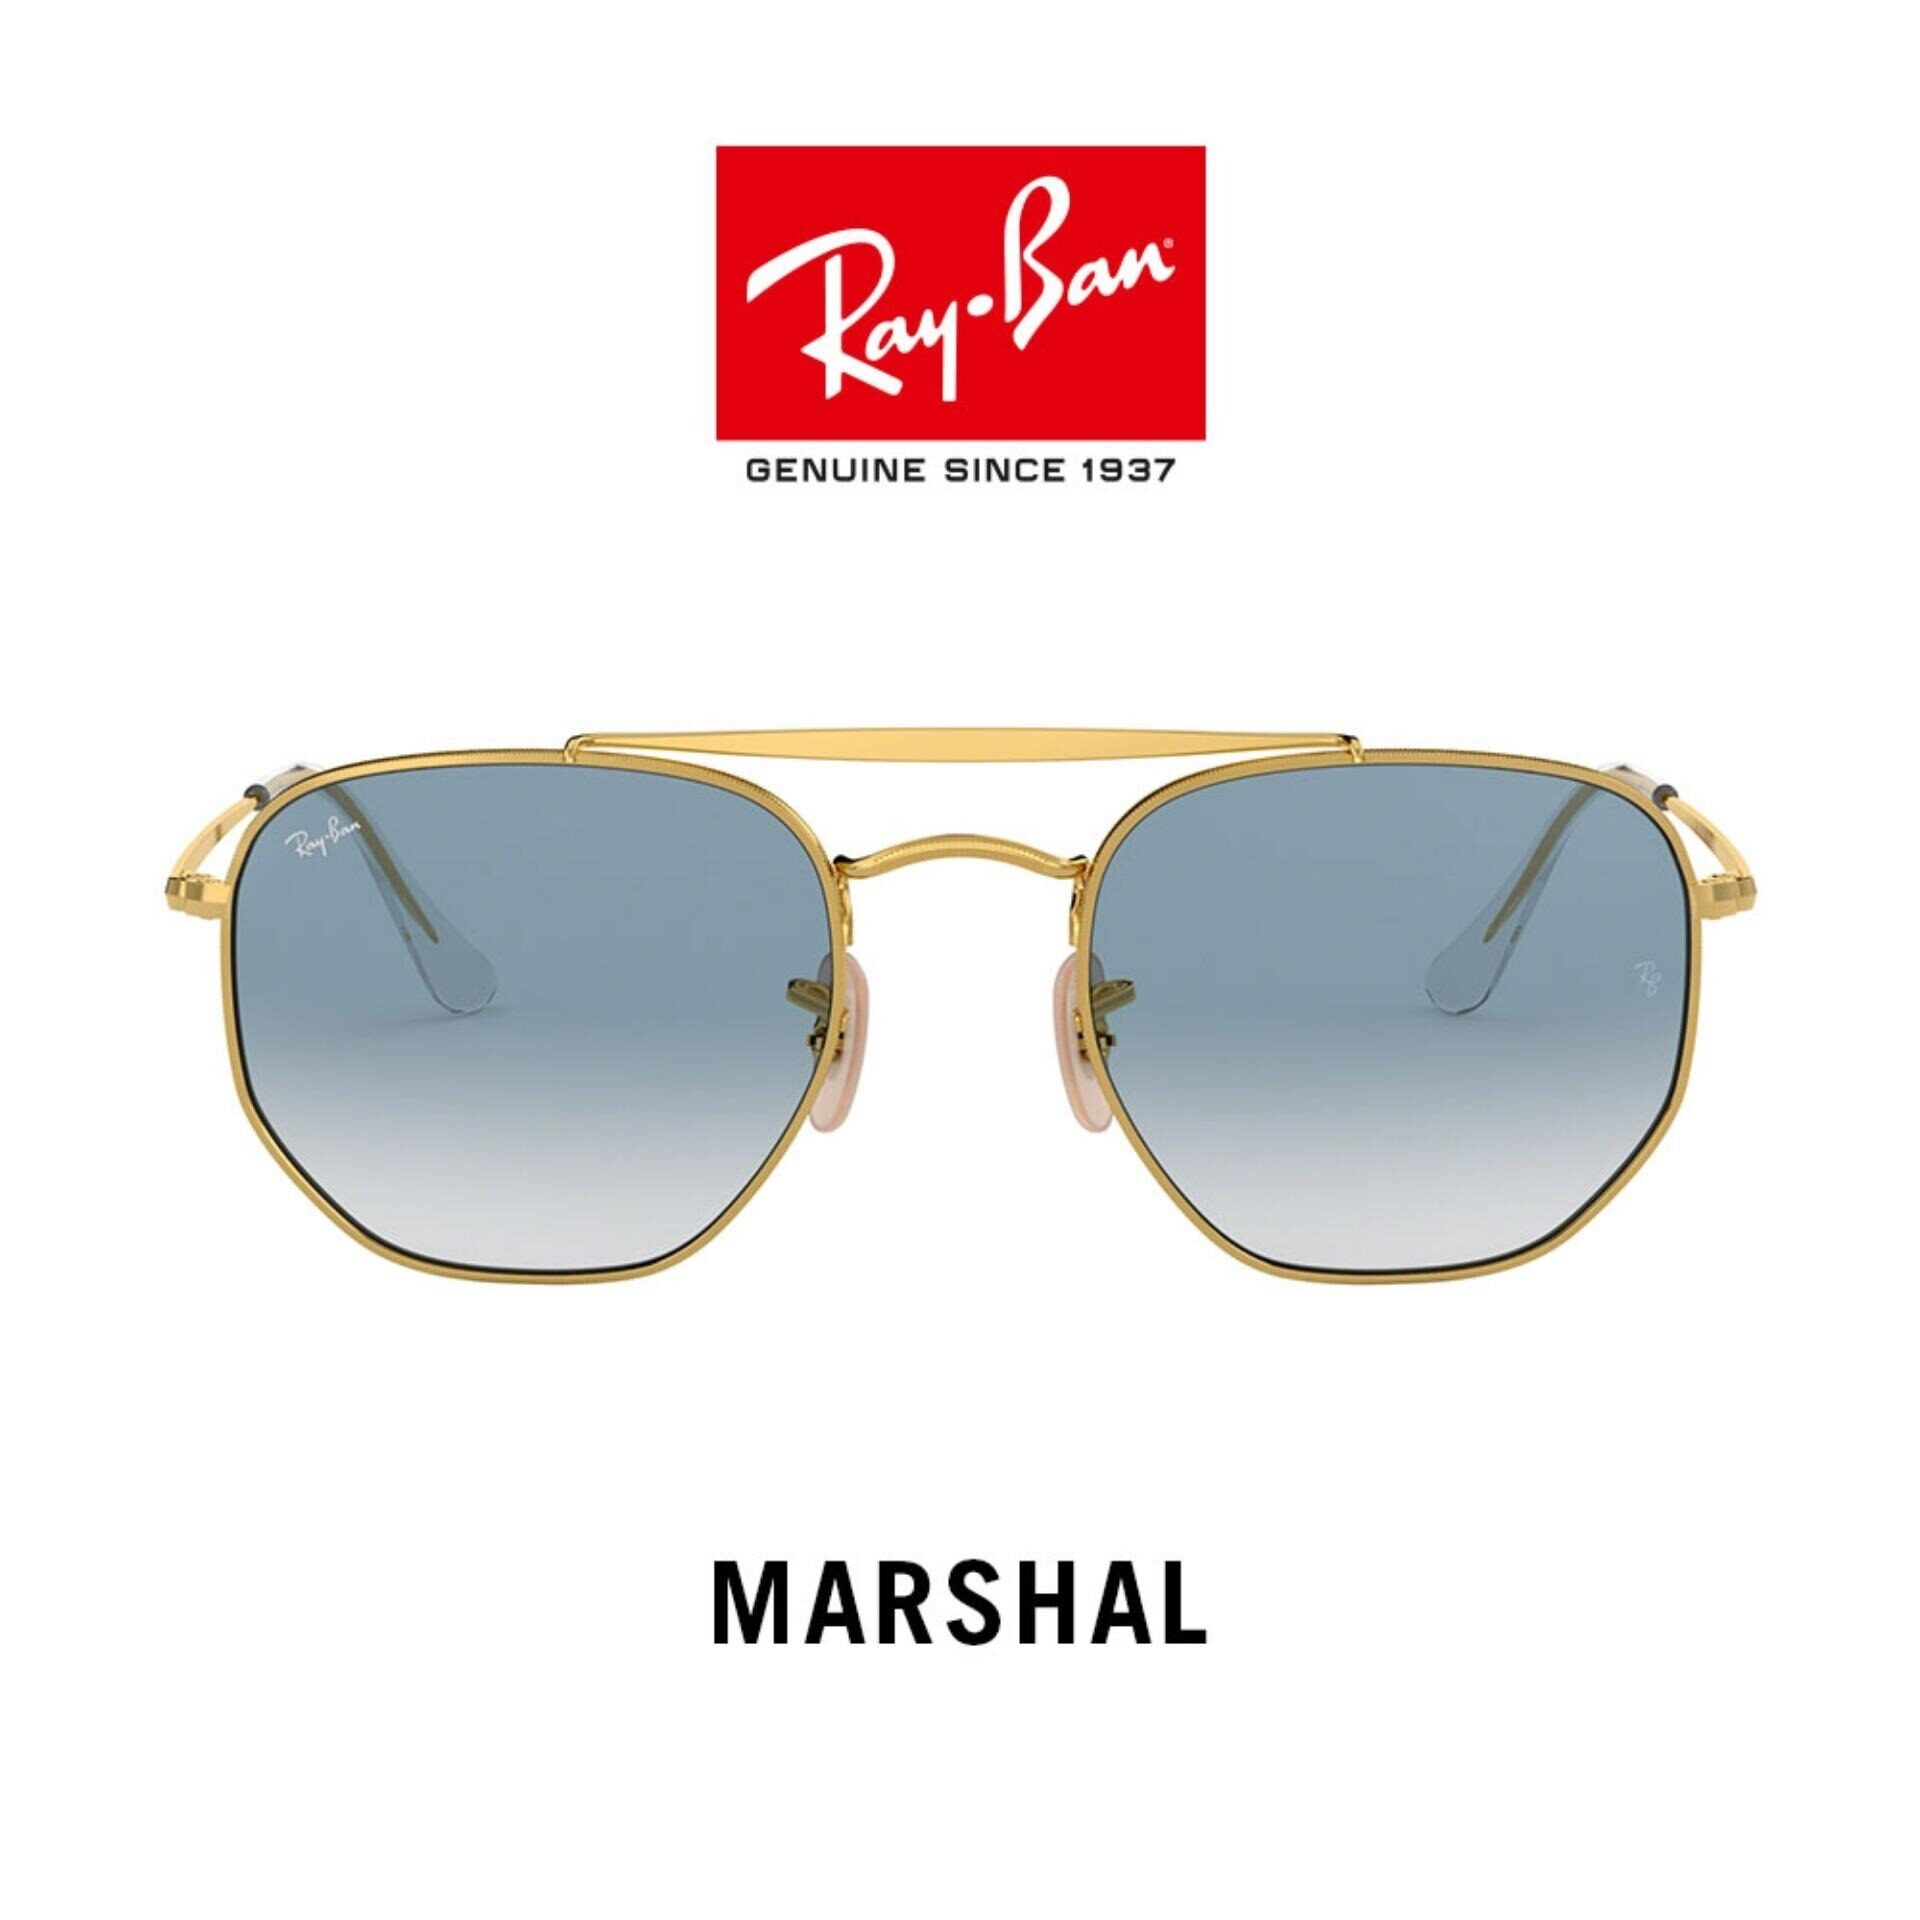 Ray-Ban Marshal - Rb3648 001/3f  Size 54 แว่นตากันแดด.